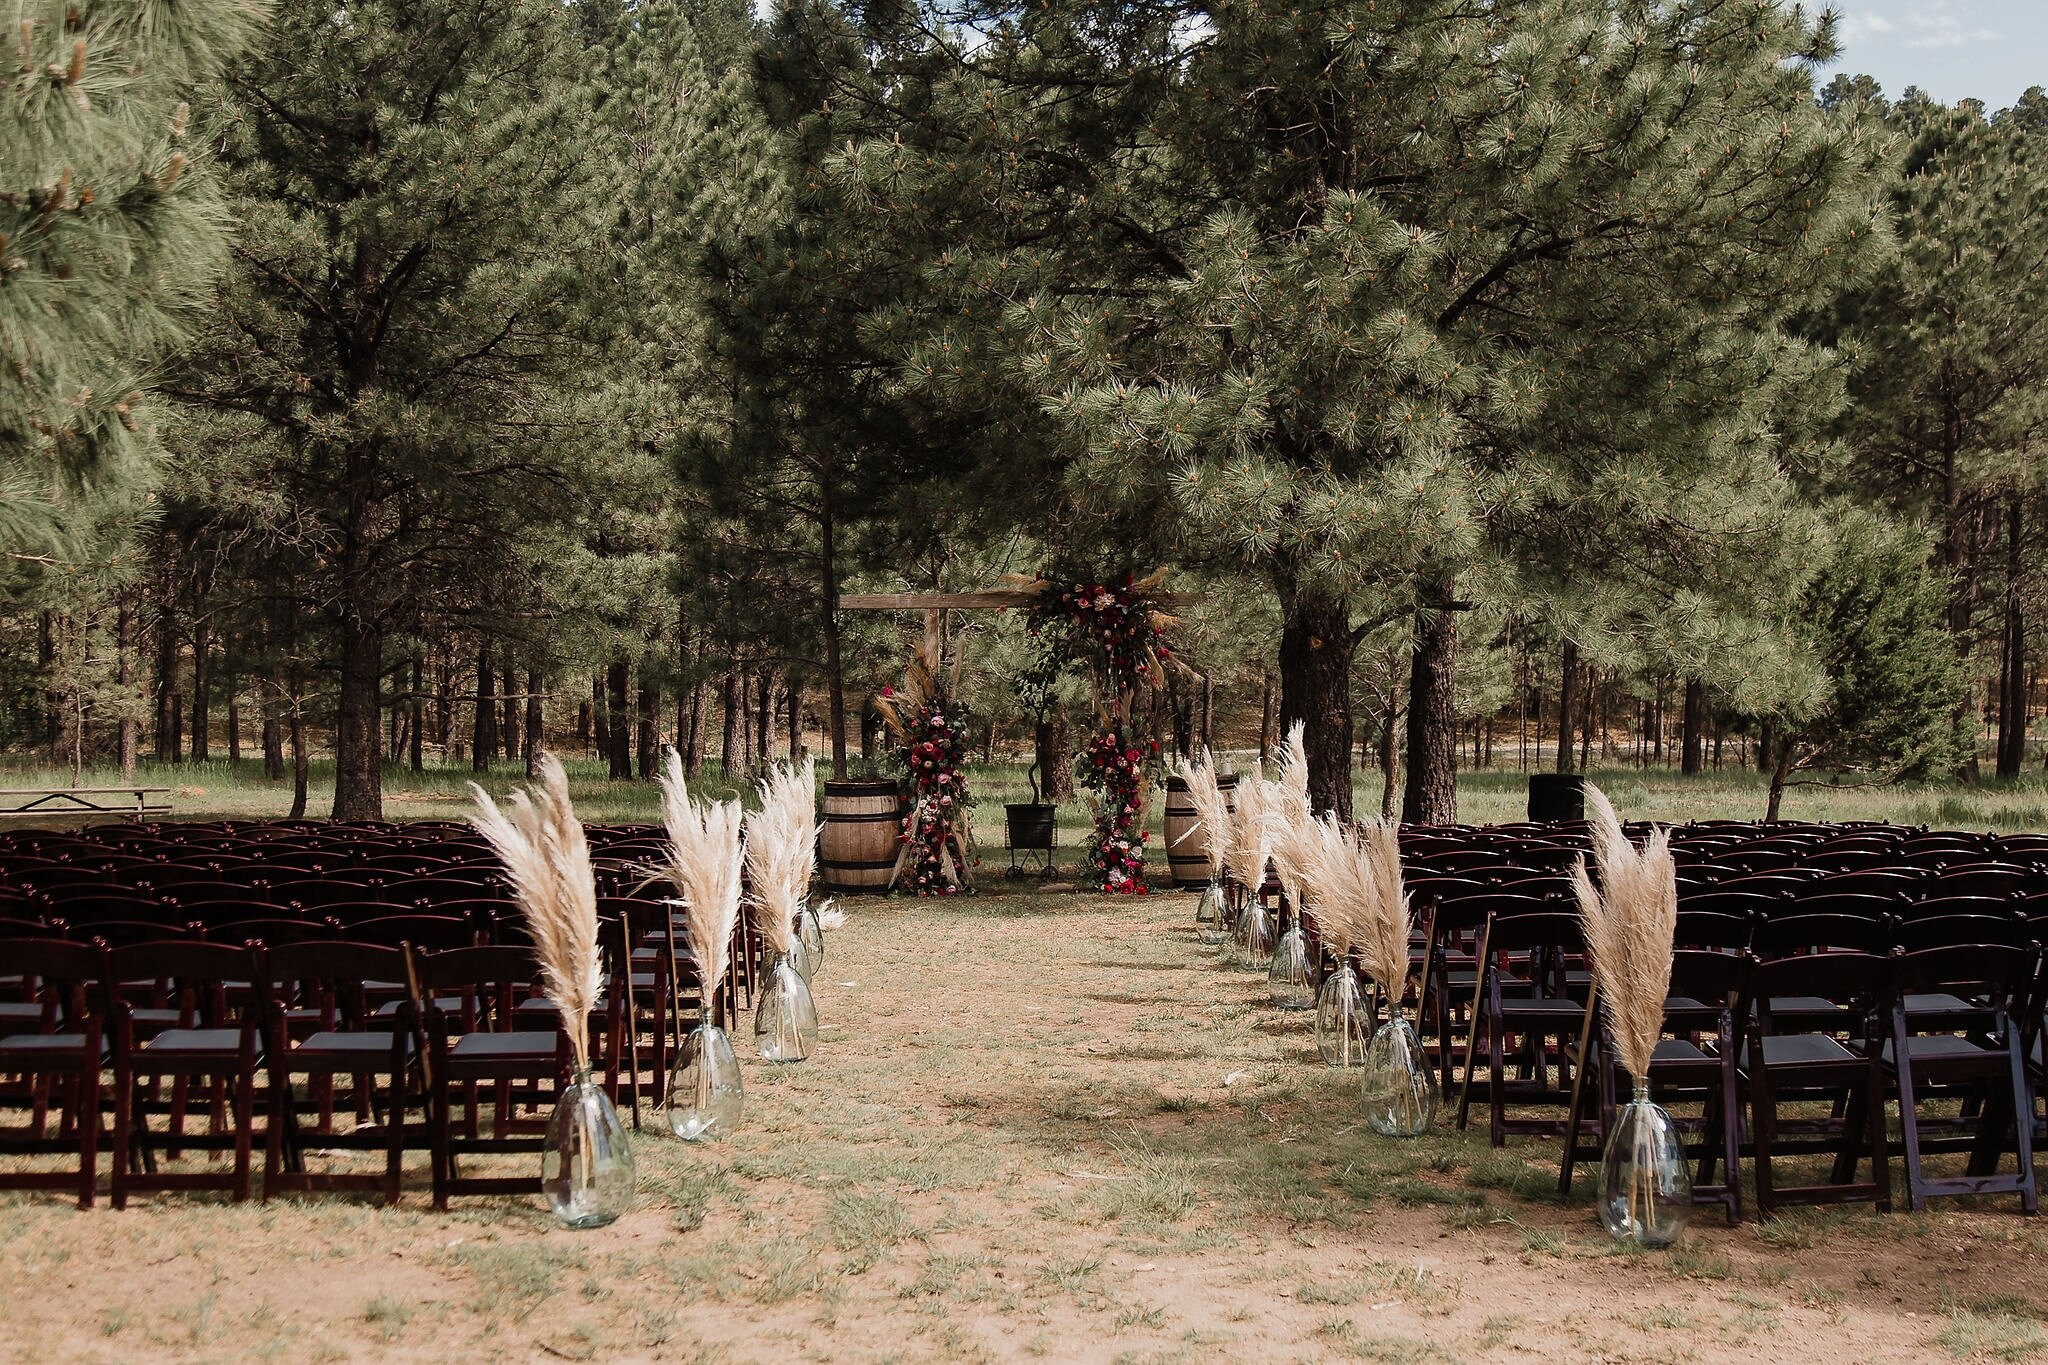 Alicia+lucia+photography+-+albuquerque+wedding+photographer+-+santa+fe+wedding+photography+-+new+mexico+wedding+photographer+-+new+mexico+wedding+-+southwest+wedding+-+destination+wedding+-+wedding+florals+-+pampas+grass+-+desert+wedding_0036.jpg